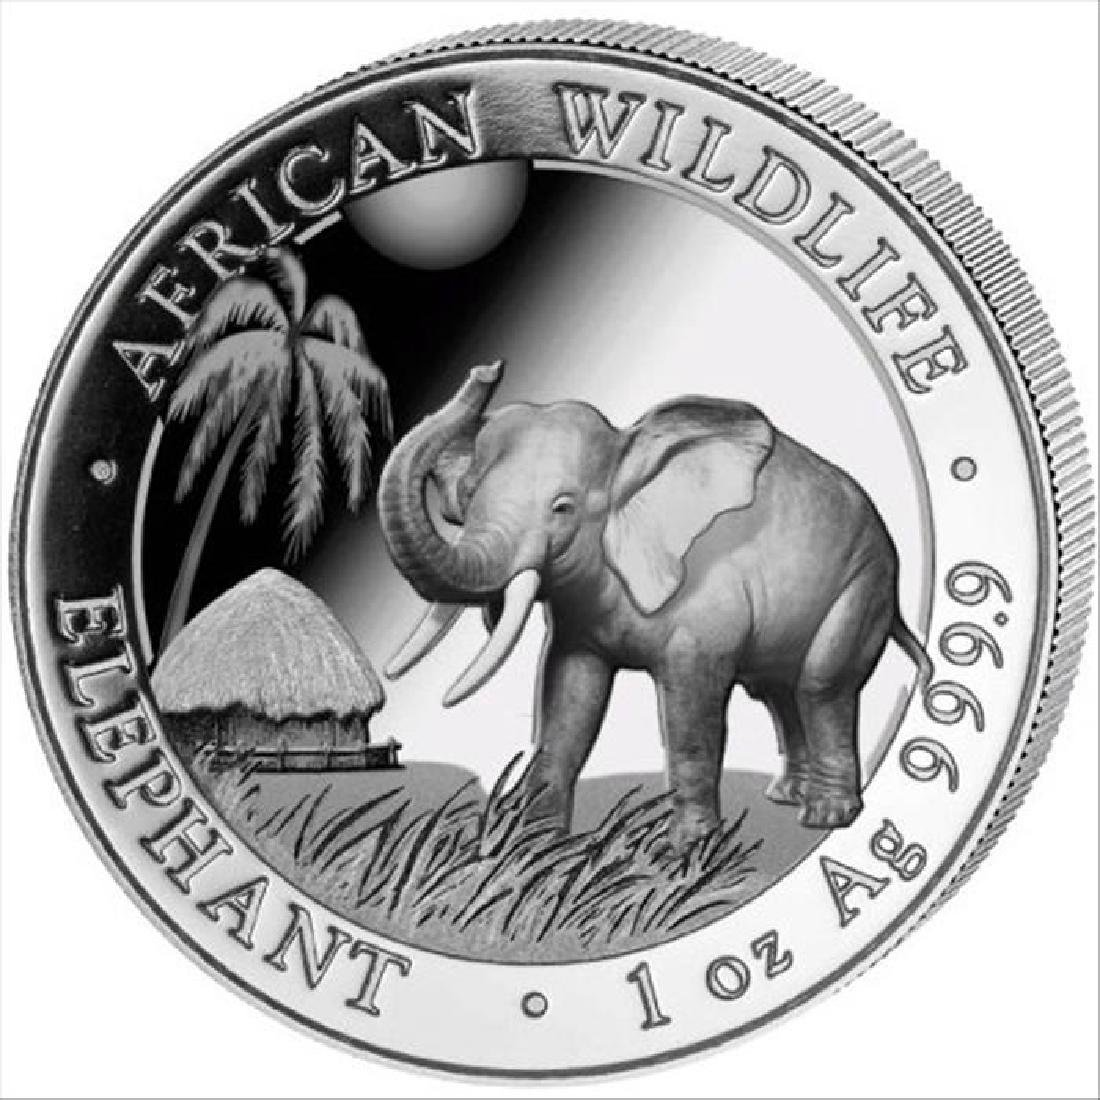 2017 1 oz Somalian Silver Elephant BU Coin